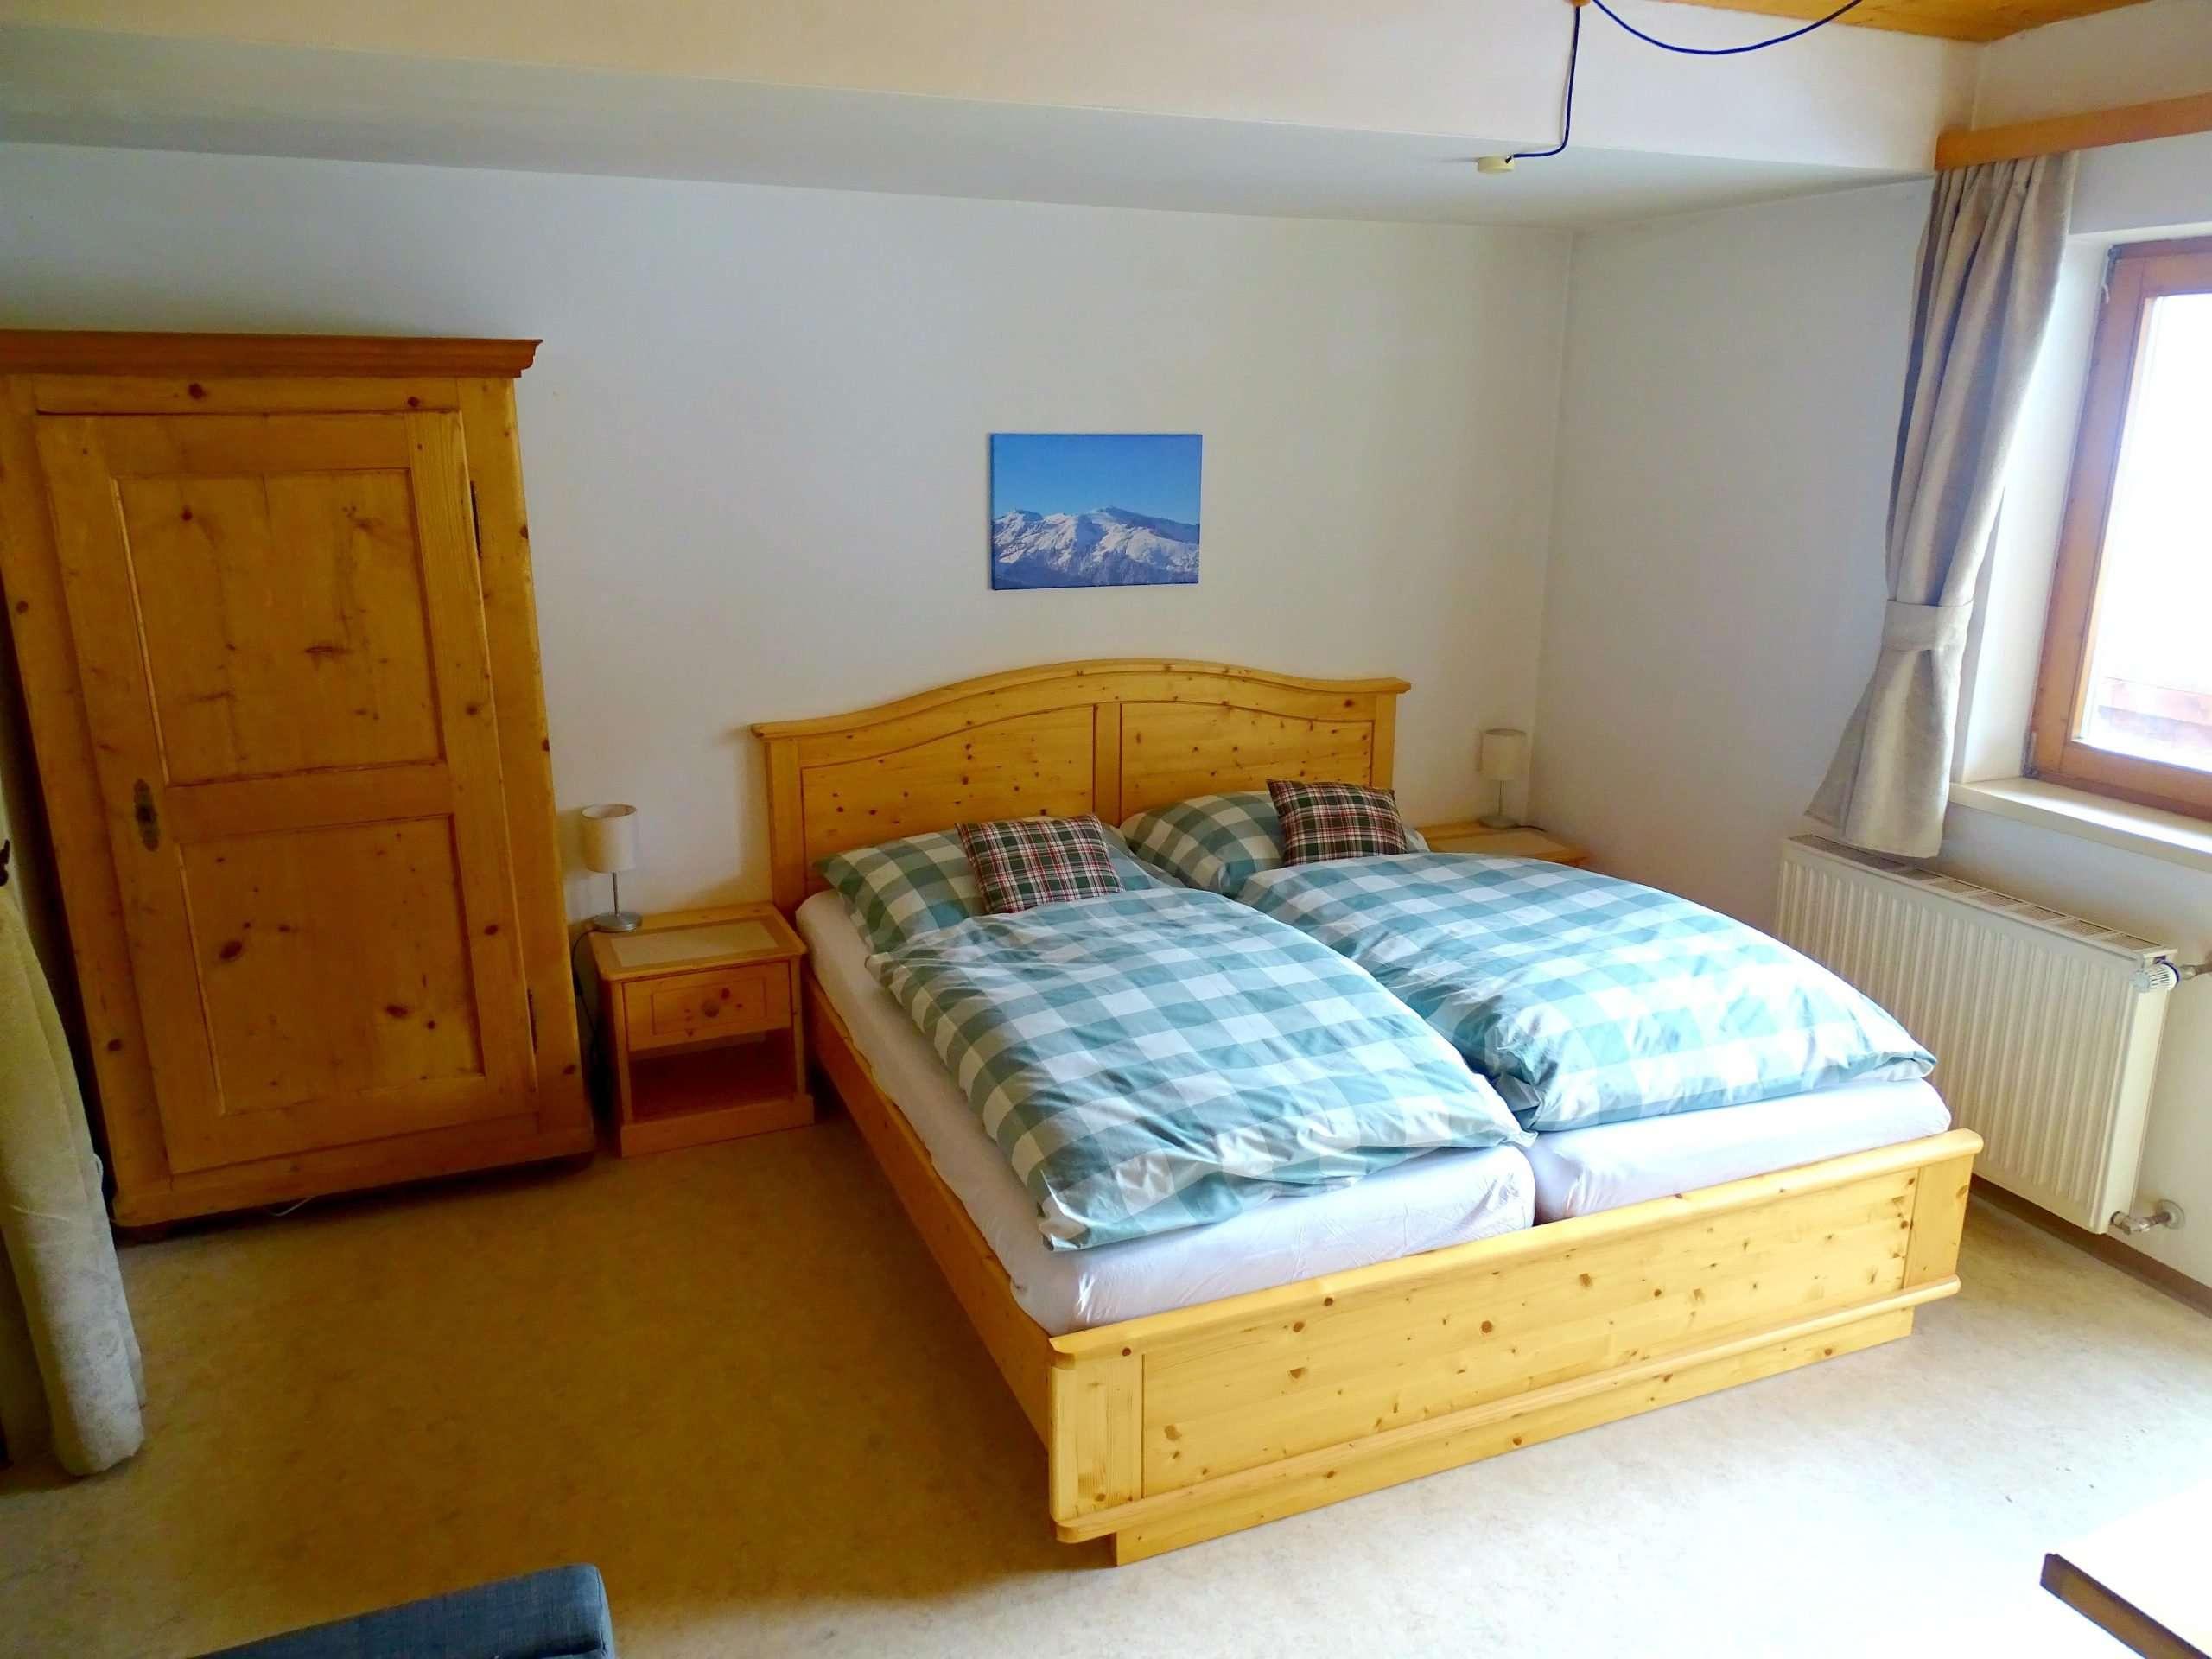 Aberg Living room, Haus Schneeberg, Hochkoenig